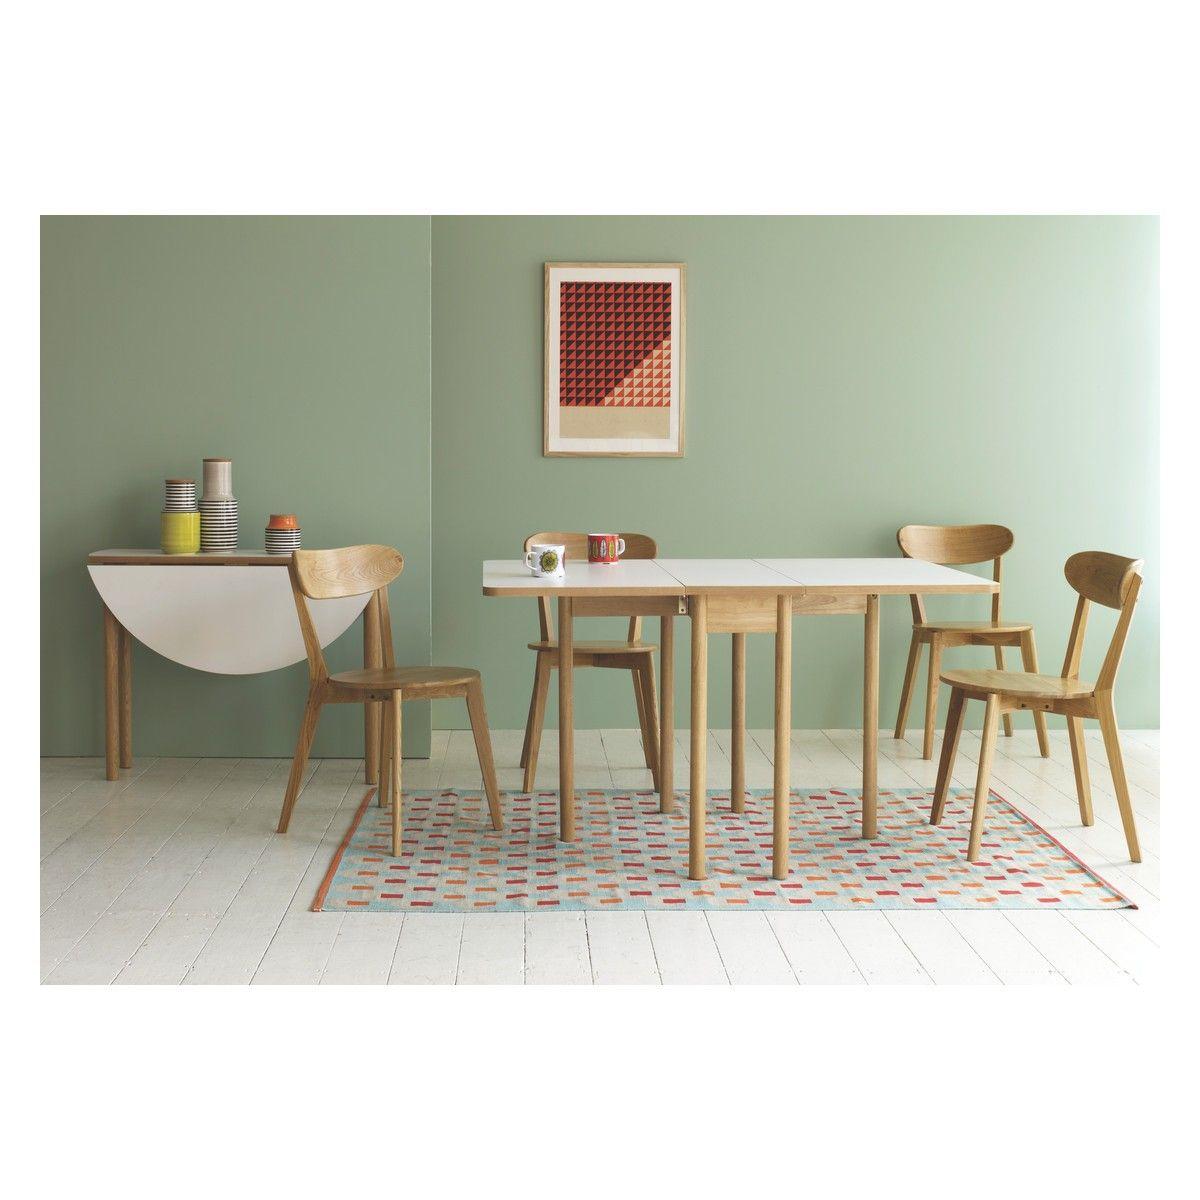 Suki 2 6 Seat White Folding Dining Table Folding Dining Table Dining Table Chairs Dining Chairs